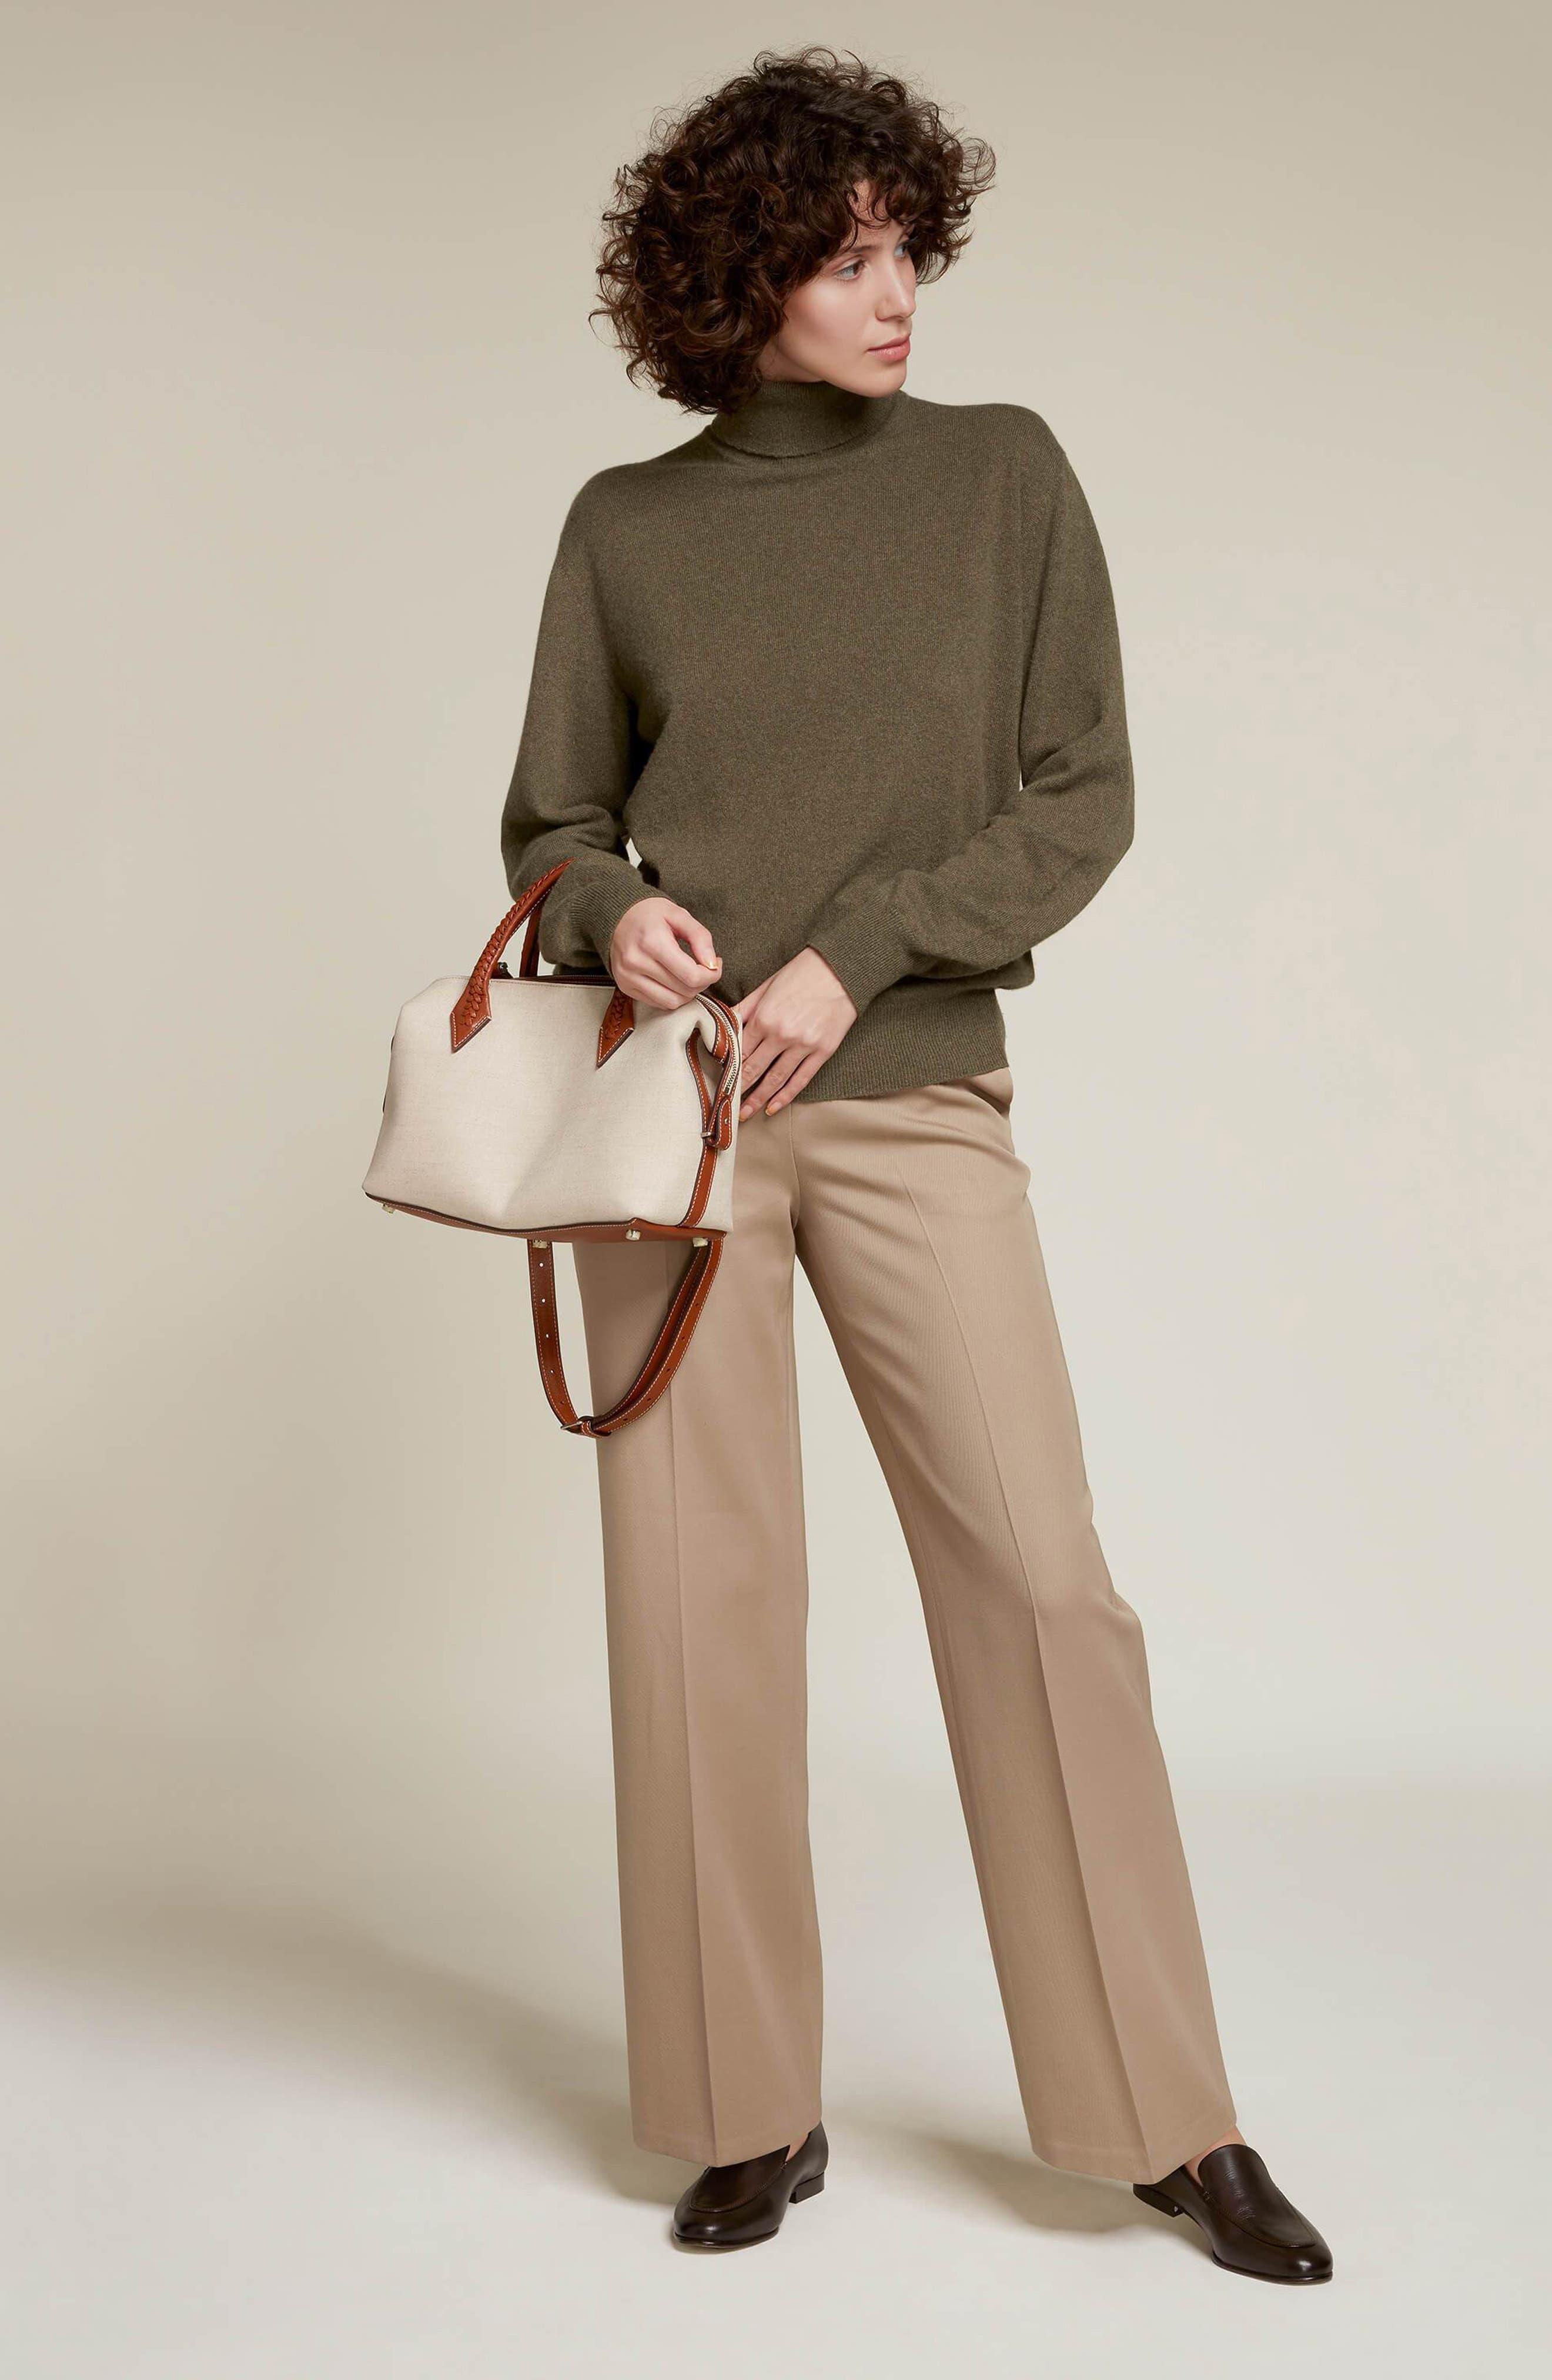 Small Perriand City Linen Duffle Handbag